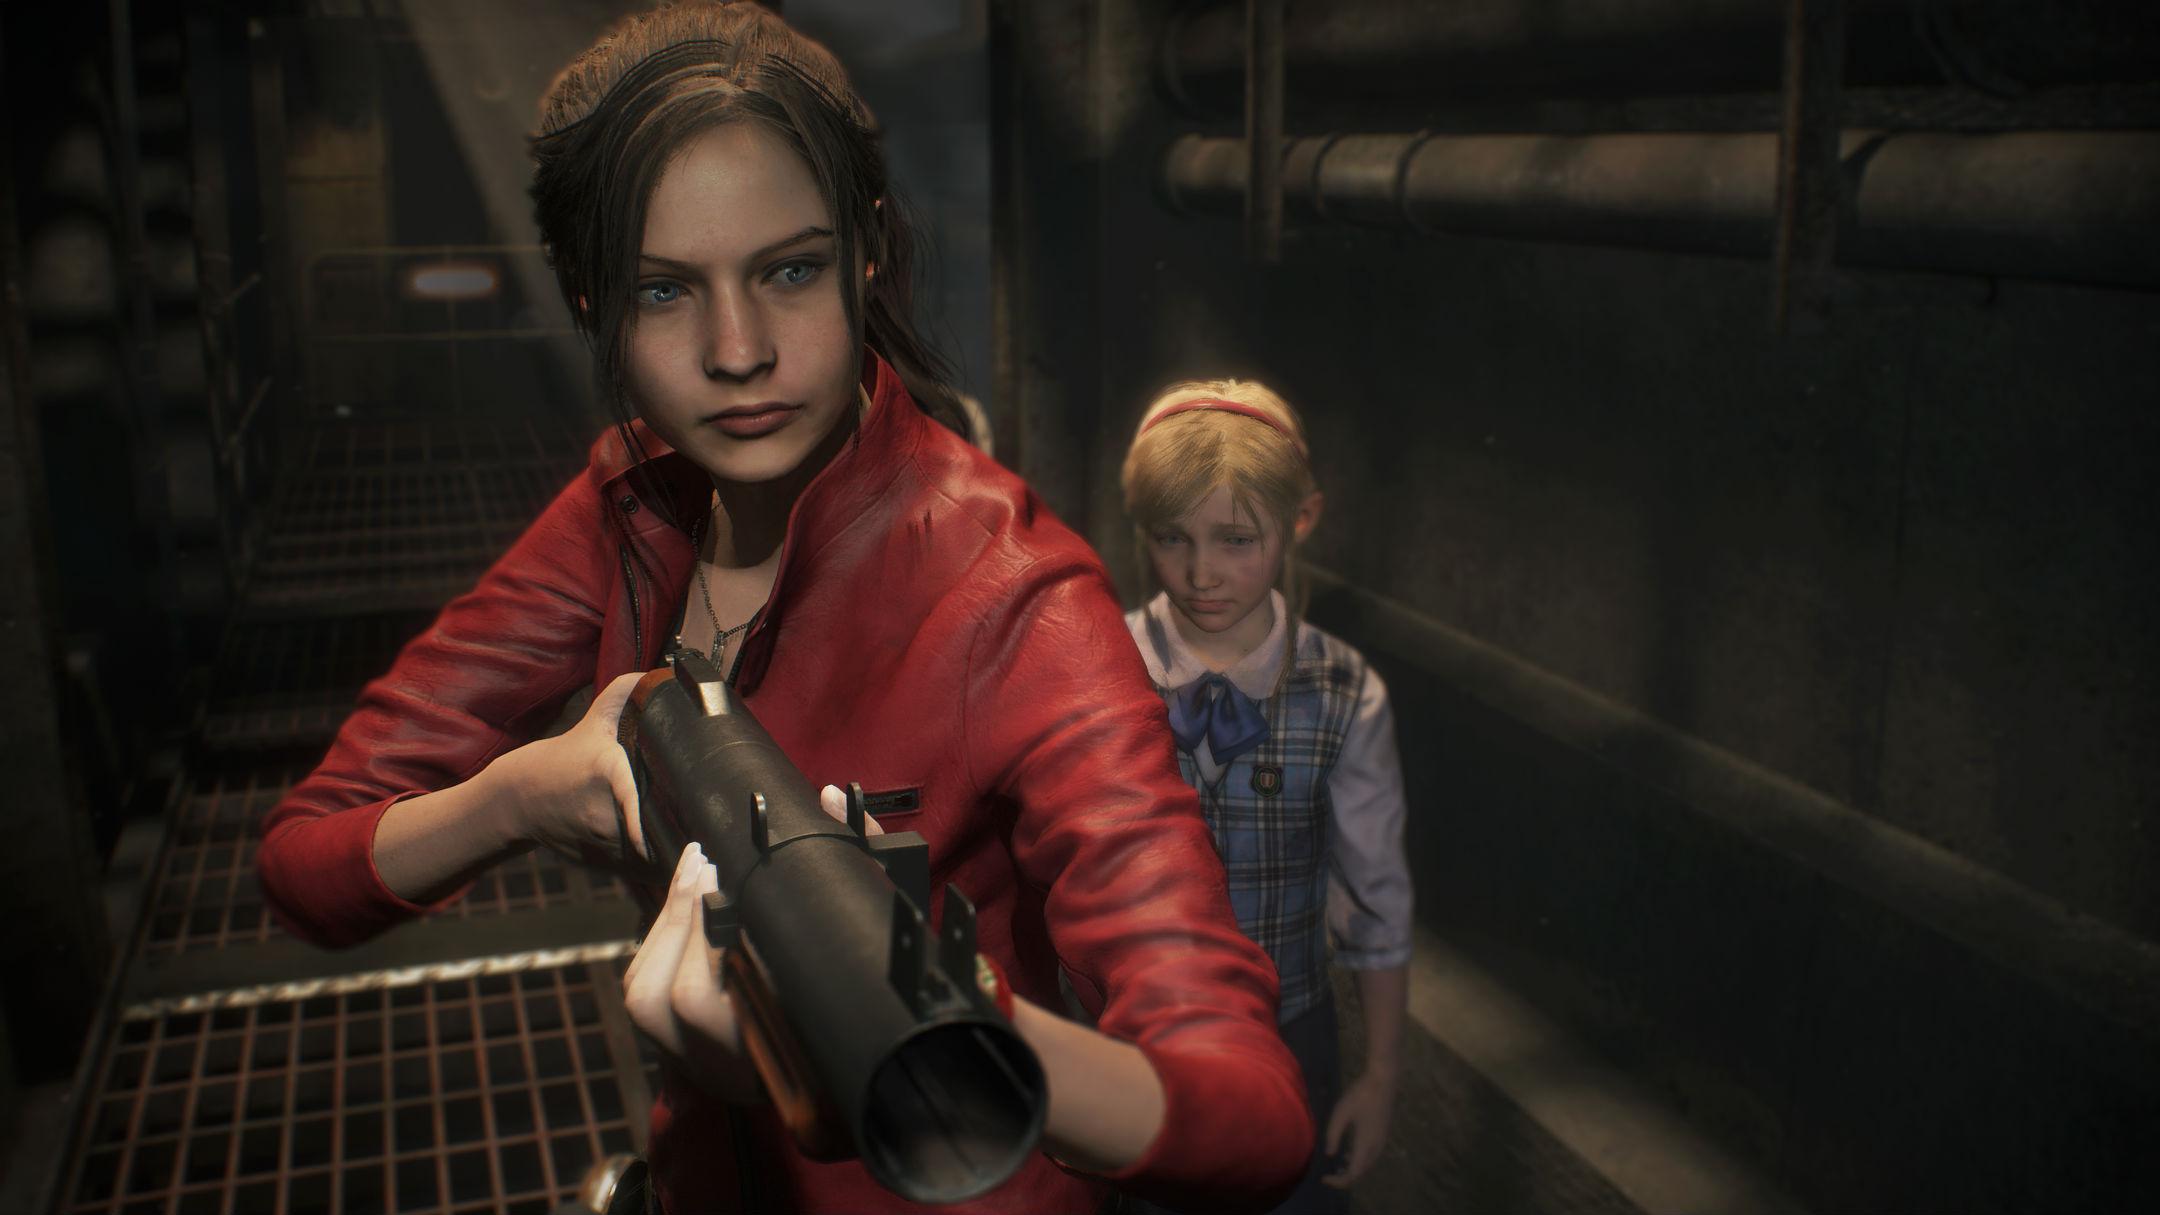 Claire Redfield armée devant Sherry Resident Evil 2 Remake